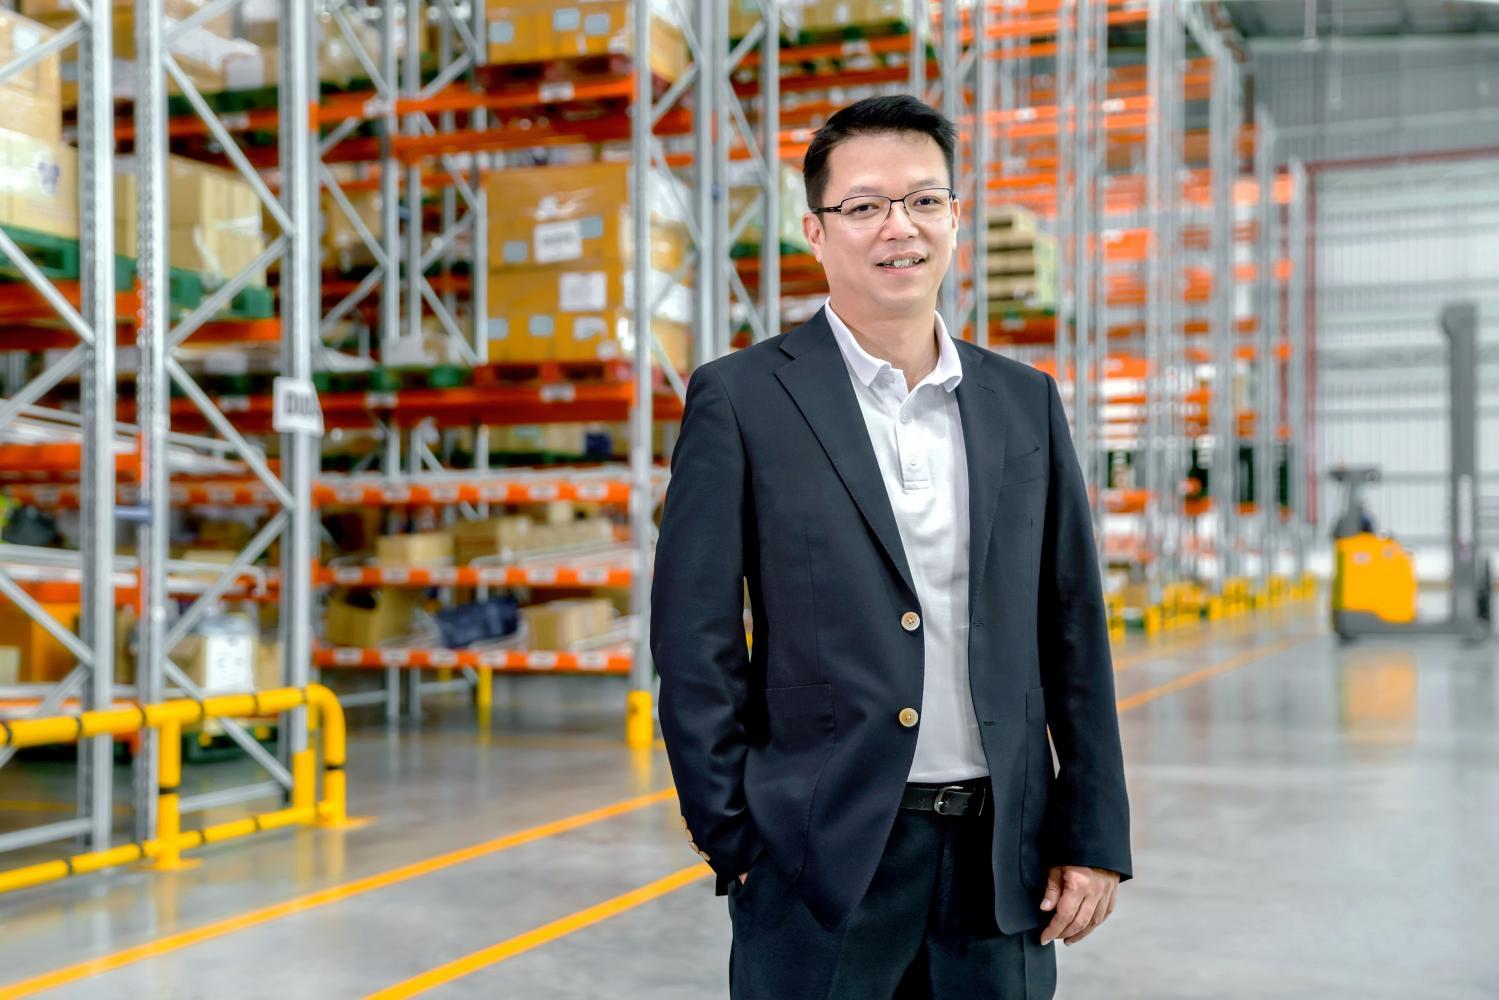 Sopon Racharaksa, CEO, Frasers Property Industrial (Thailand).